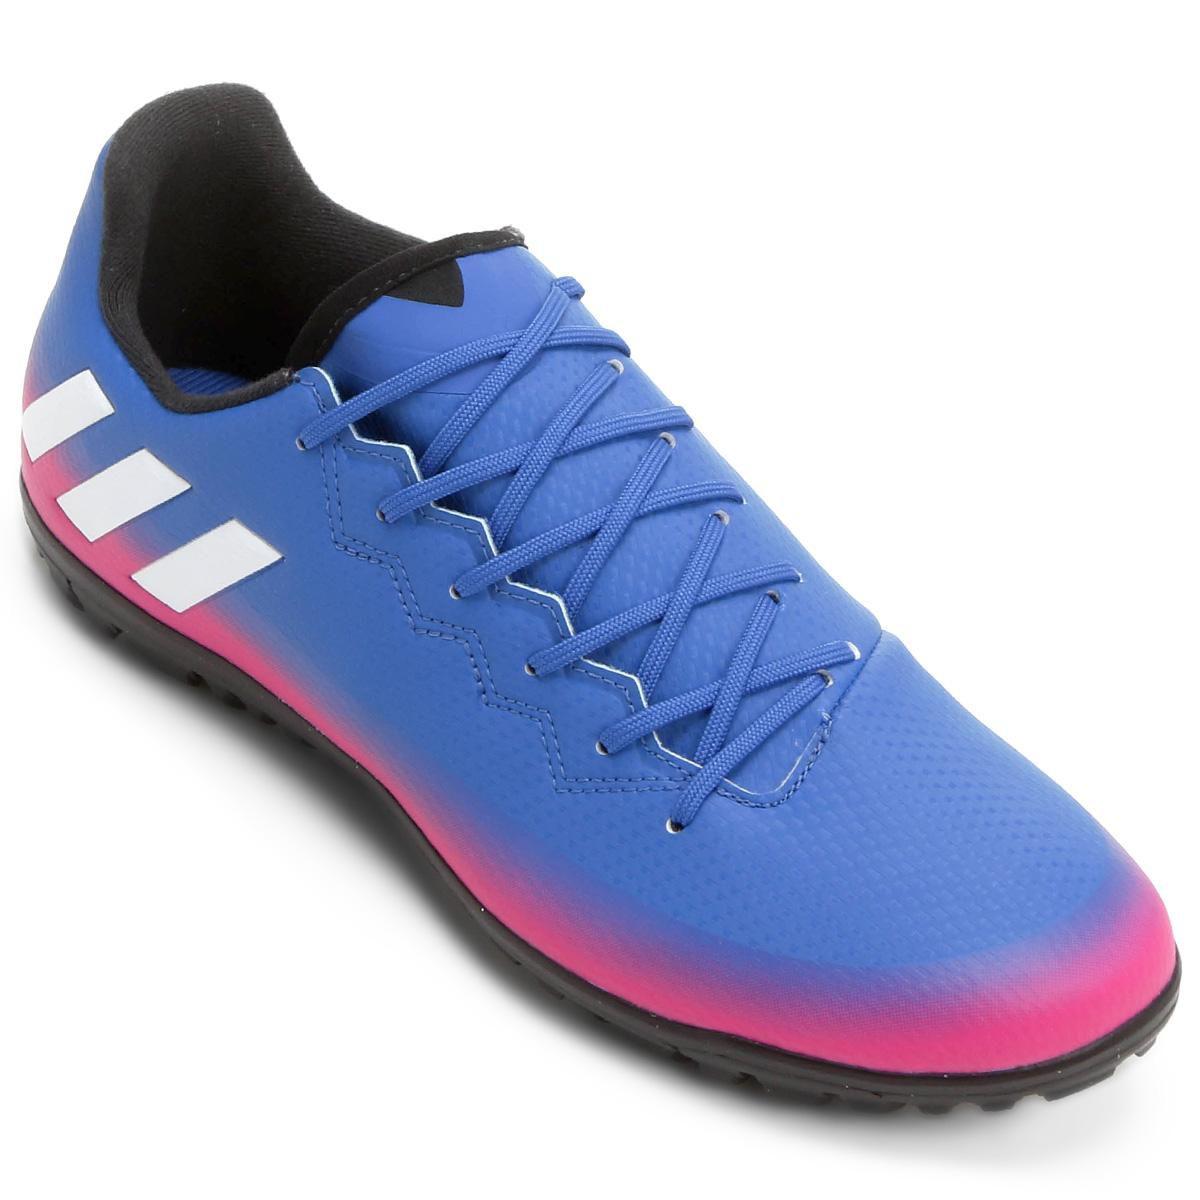 6bd681b957965 Chuteira Society Adidas Messi 16.3 Tf - BRACIA SHOP  Loja de Roupas ...